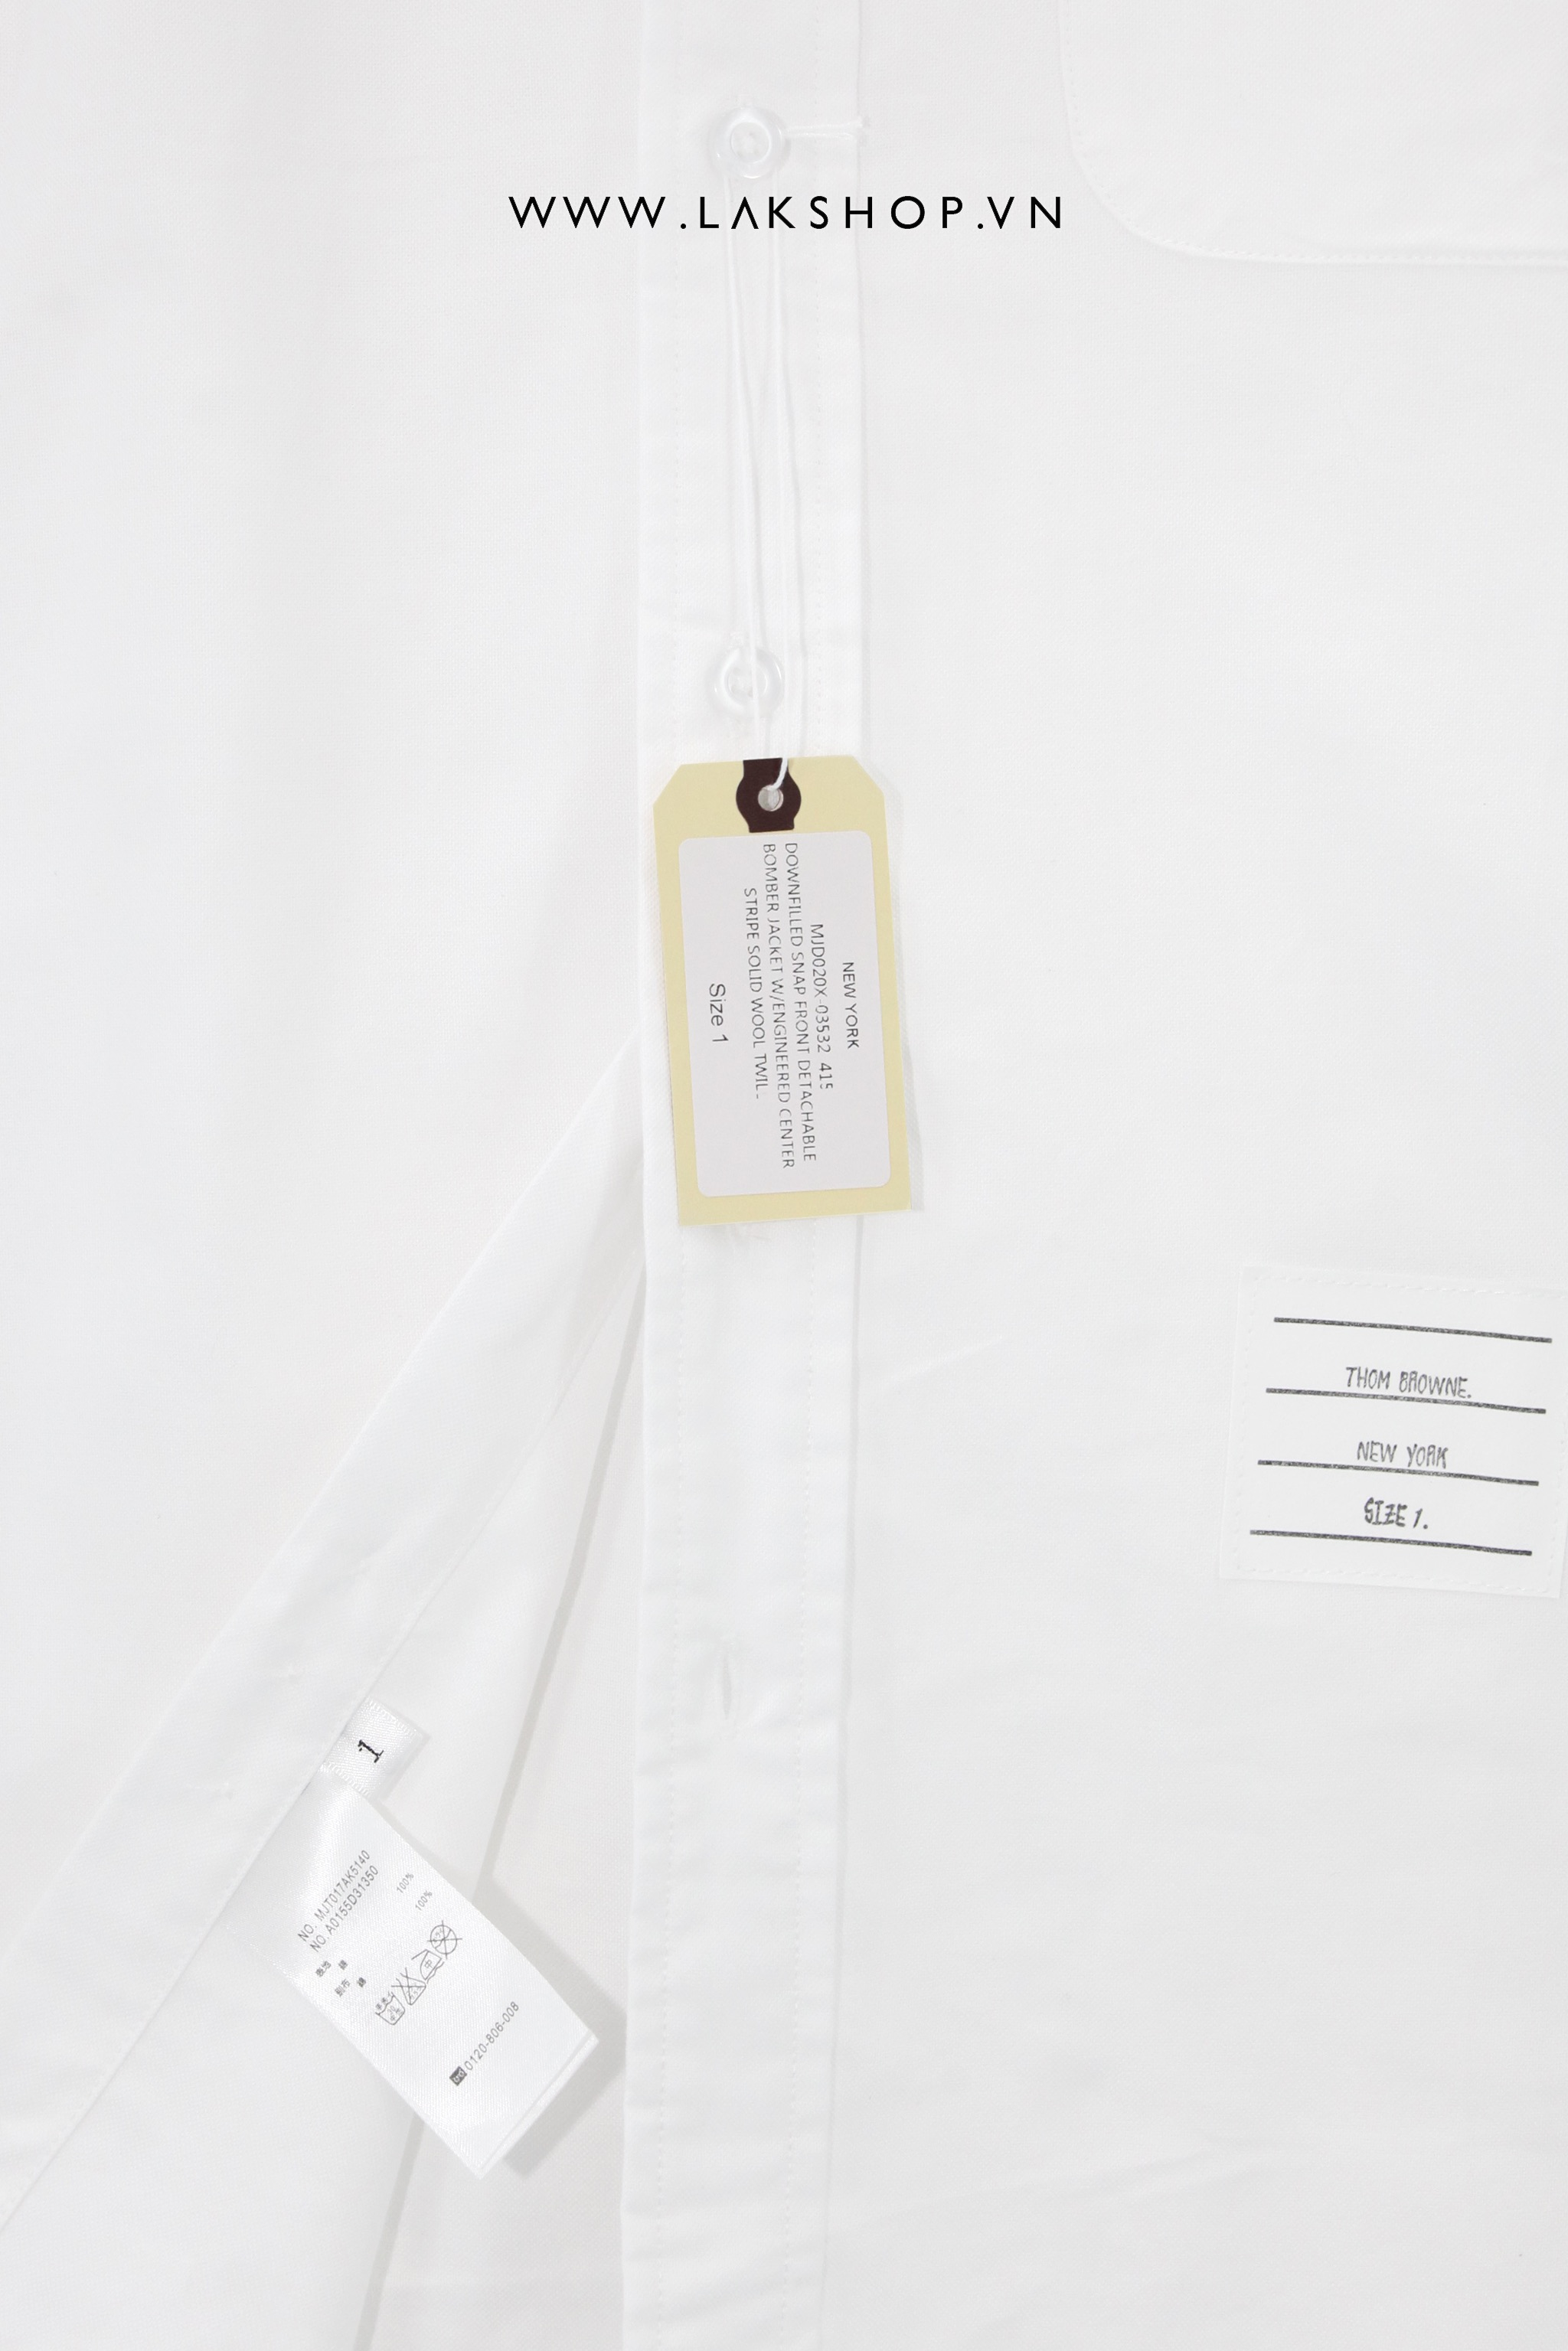 [NEW] Thom Browne White Cotton Oxford Grosgrain Armband Shirt (Bản Đẹp)